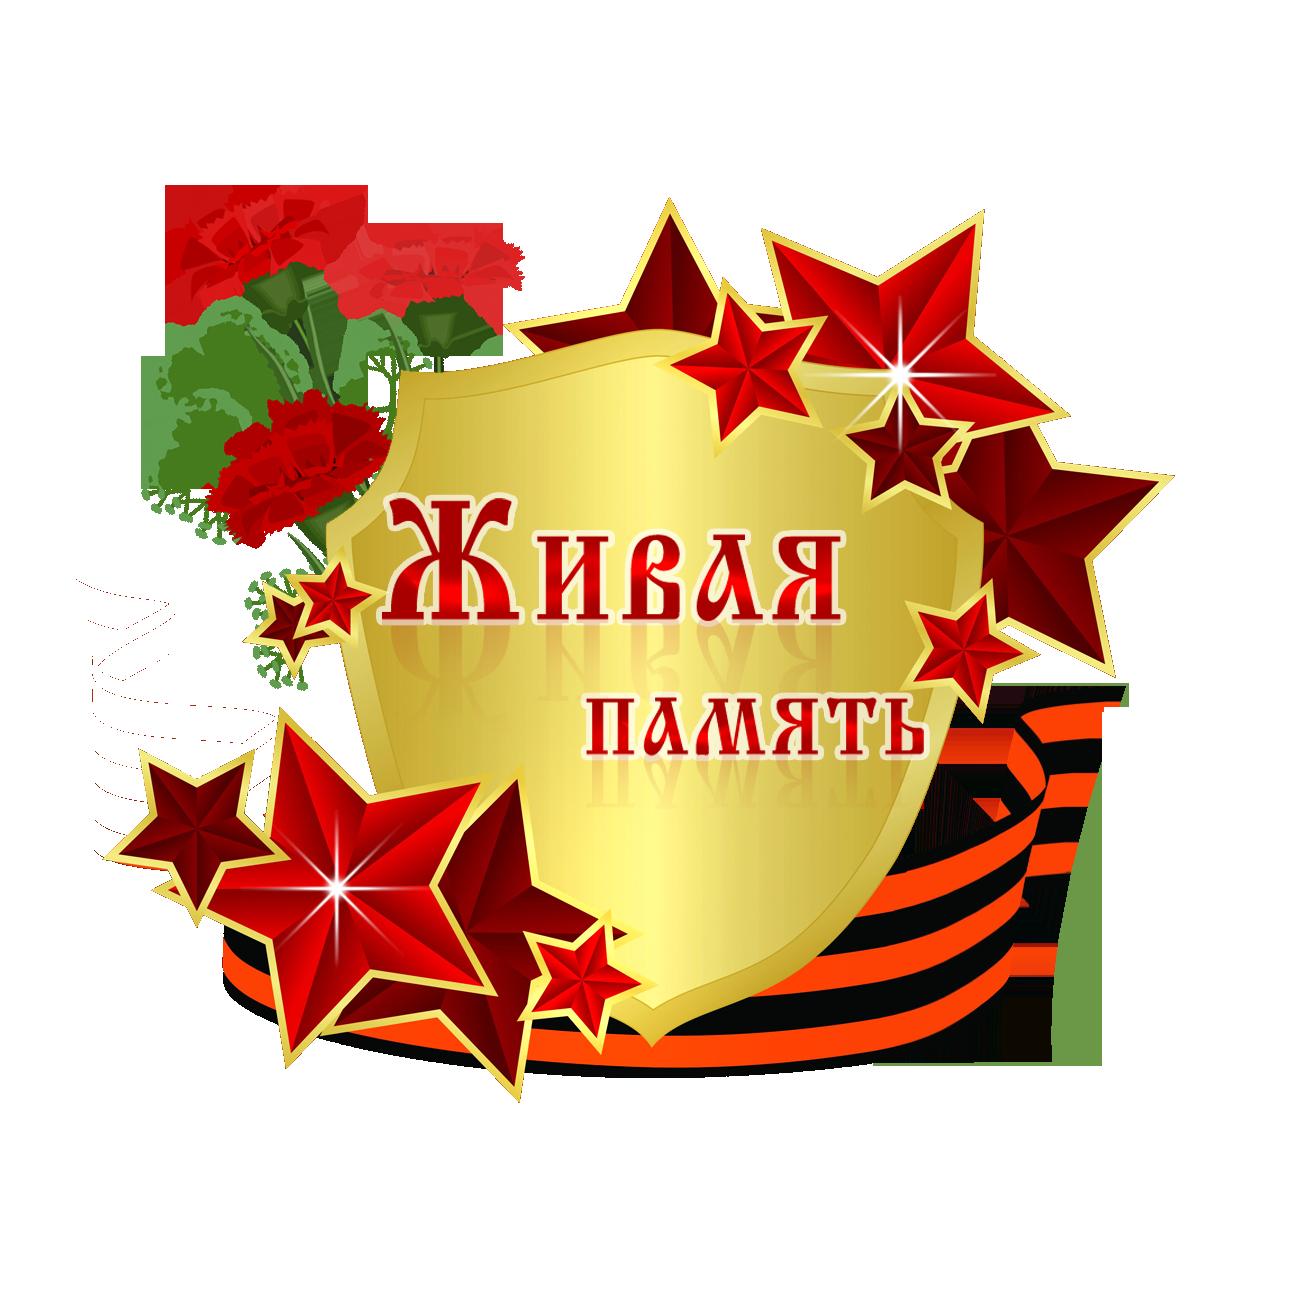 http://soyuz-pisatelei.ru/news/2015-05-26-1102